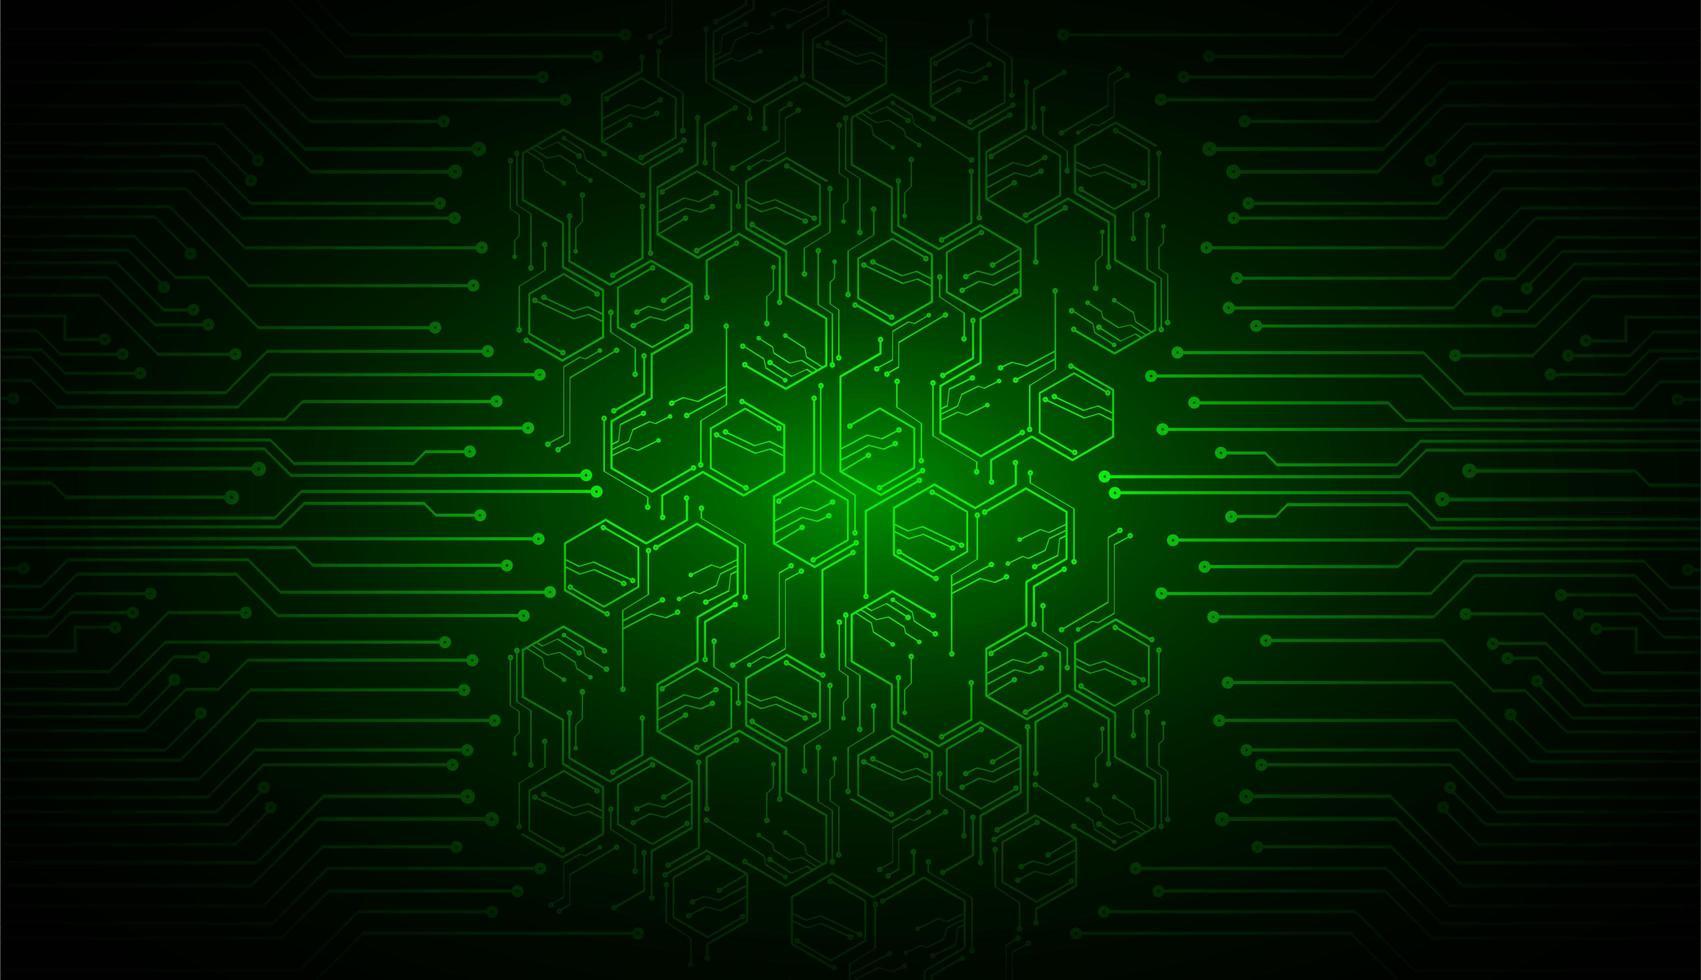 grönt cyberkrets framtida teknologikoncept vektor